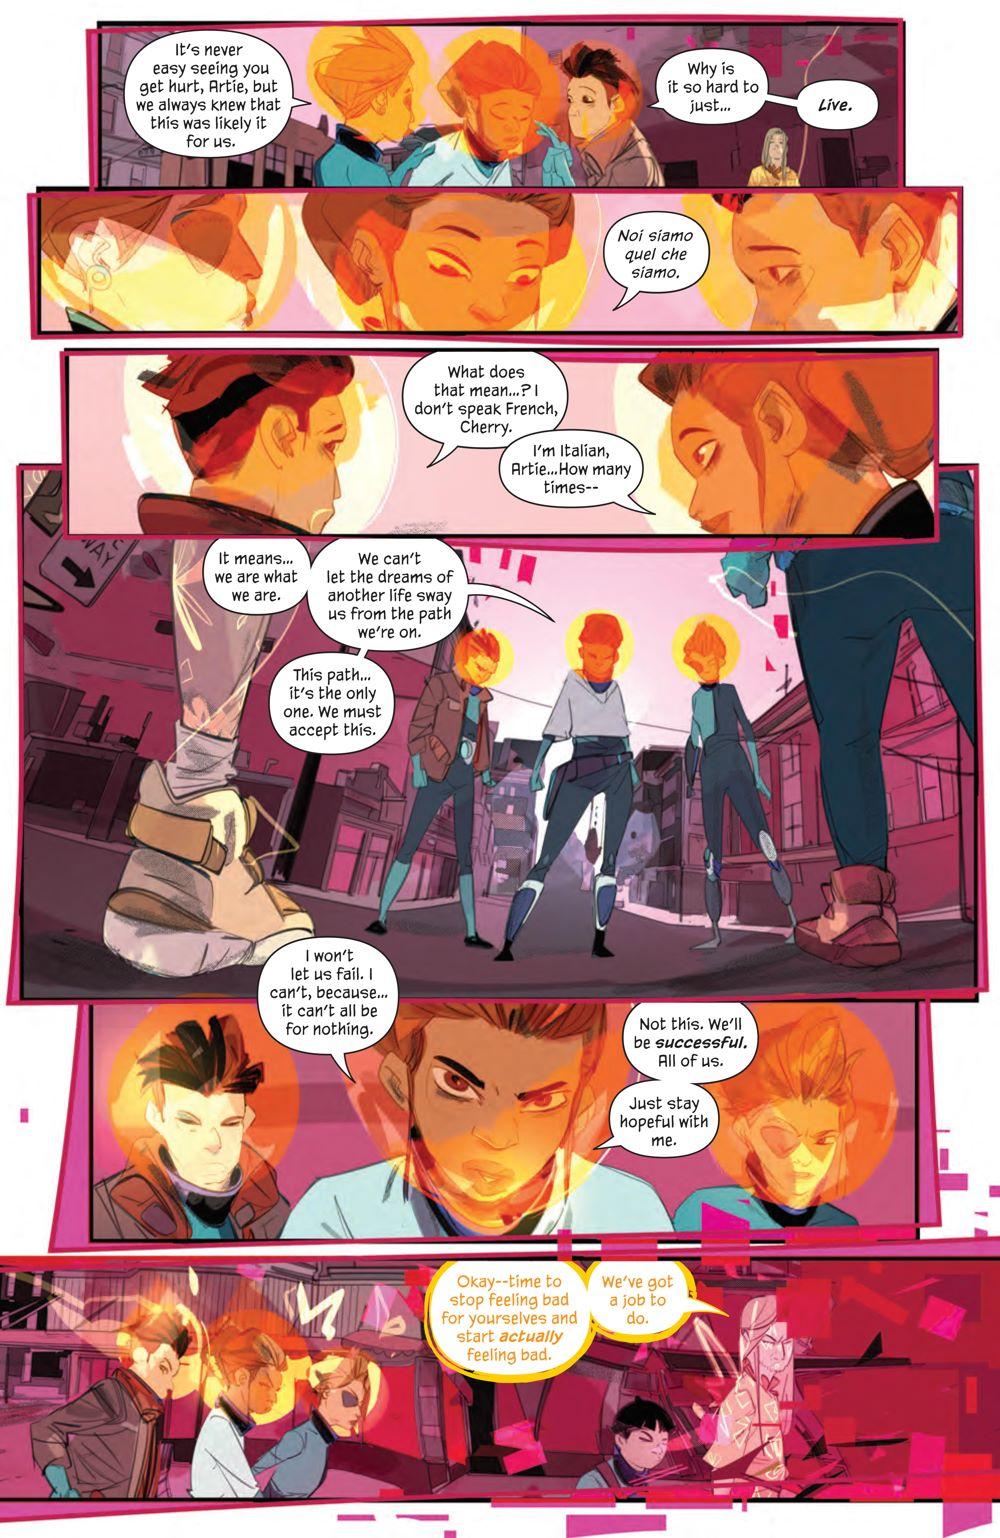 GoodLuck_004_PRESS_8 ComicList Previews: GOOD LUCK #4 (OF 5)